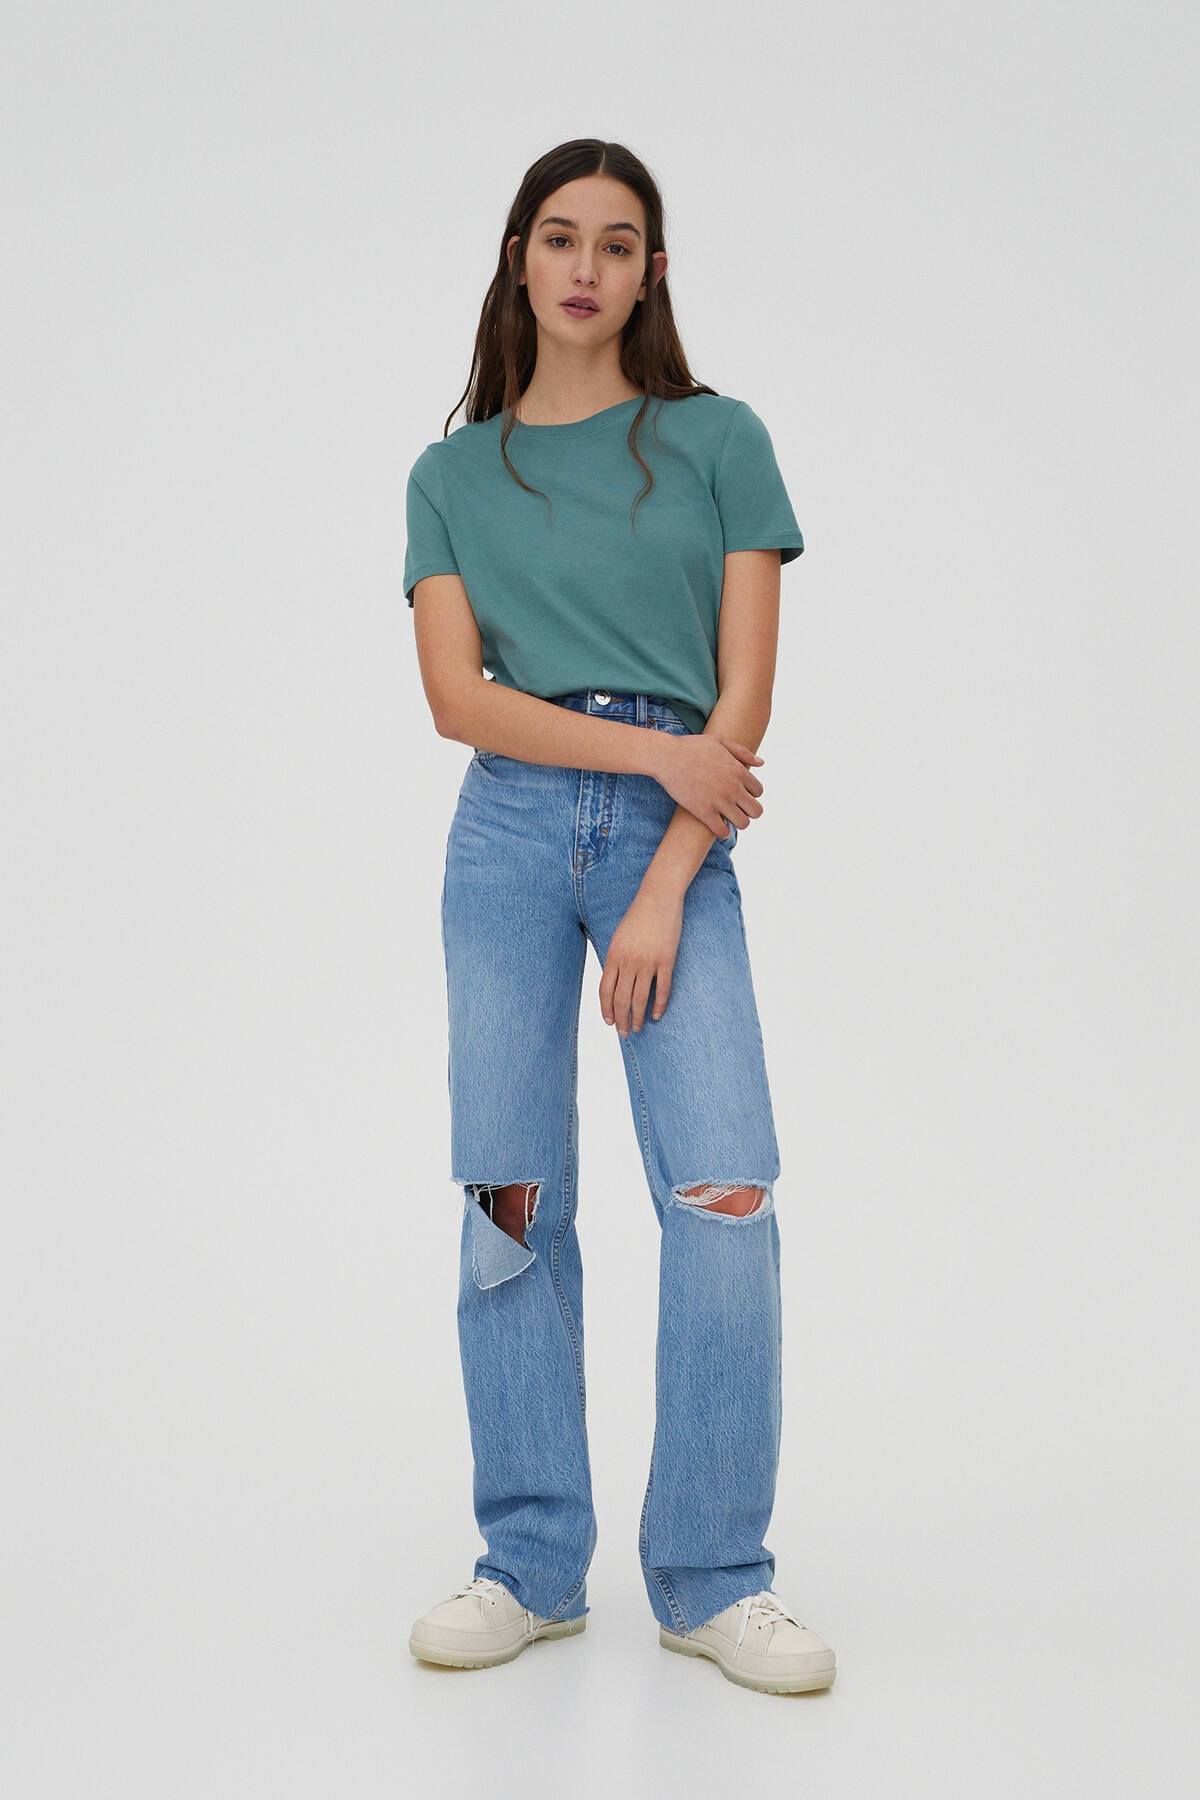 Pull & Bear Kadın Yeşil Basic Bisiklet Yaka T-Shirt 05244357 1